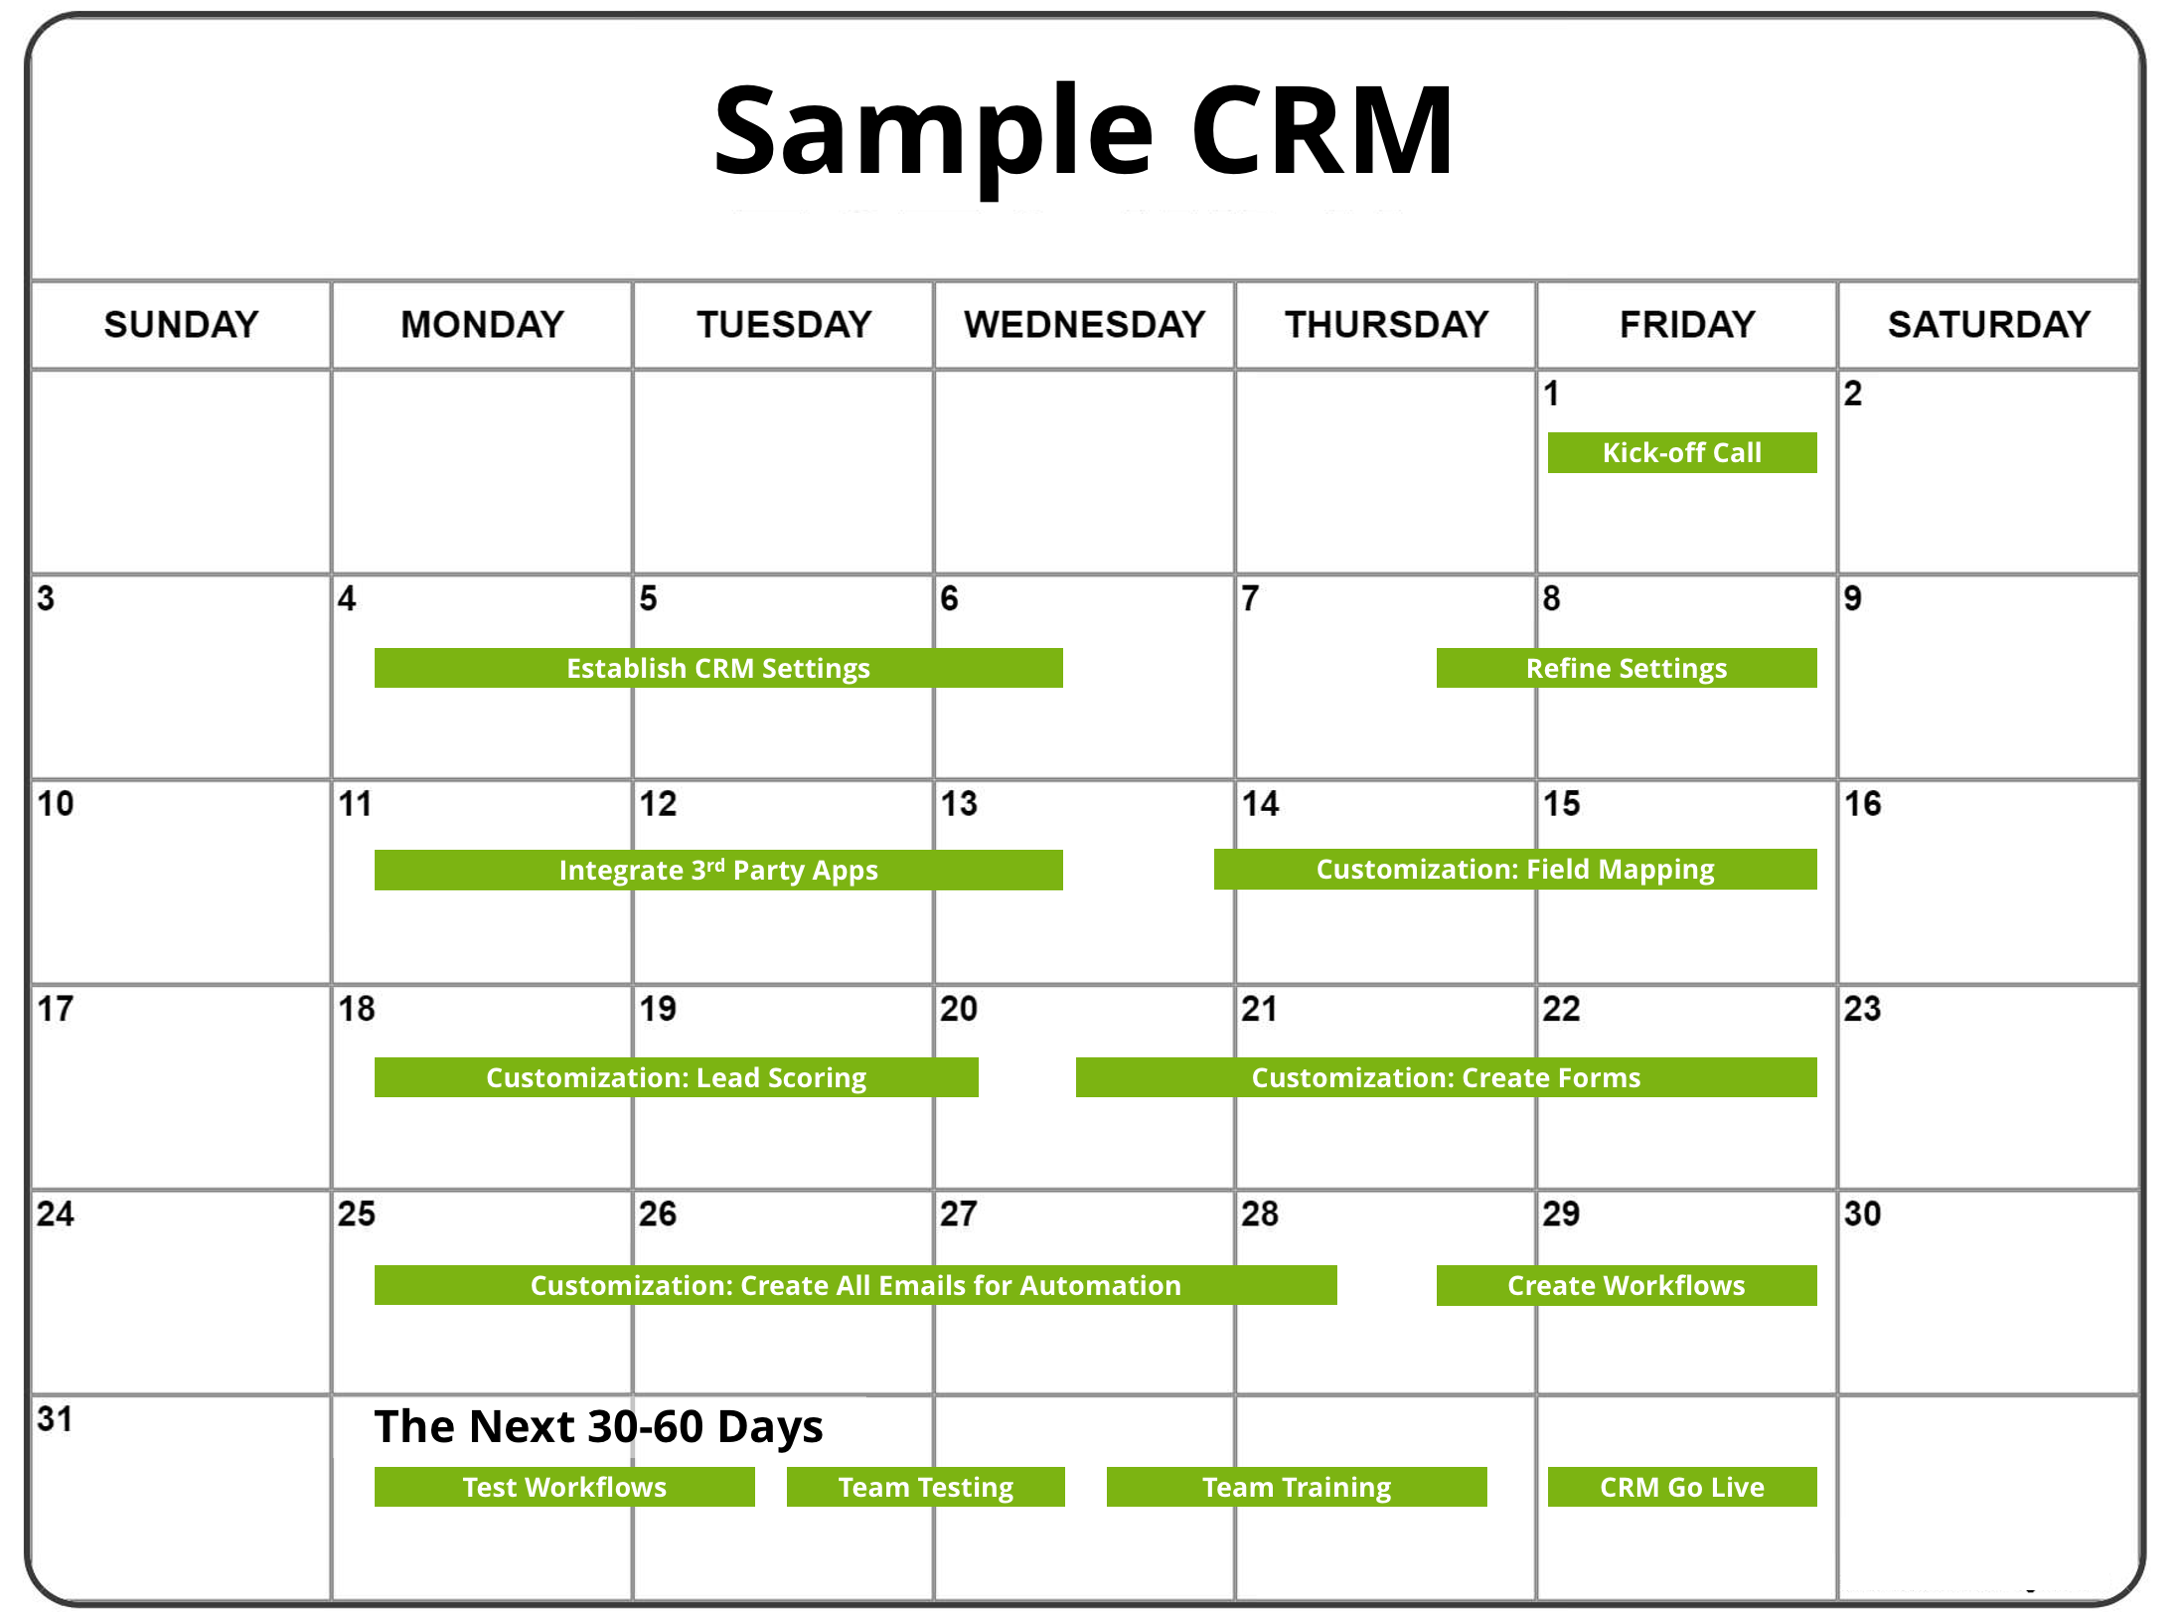 Sample_CRM Implementation